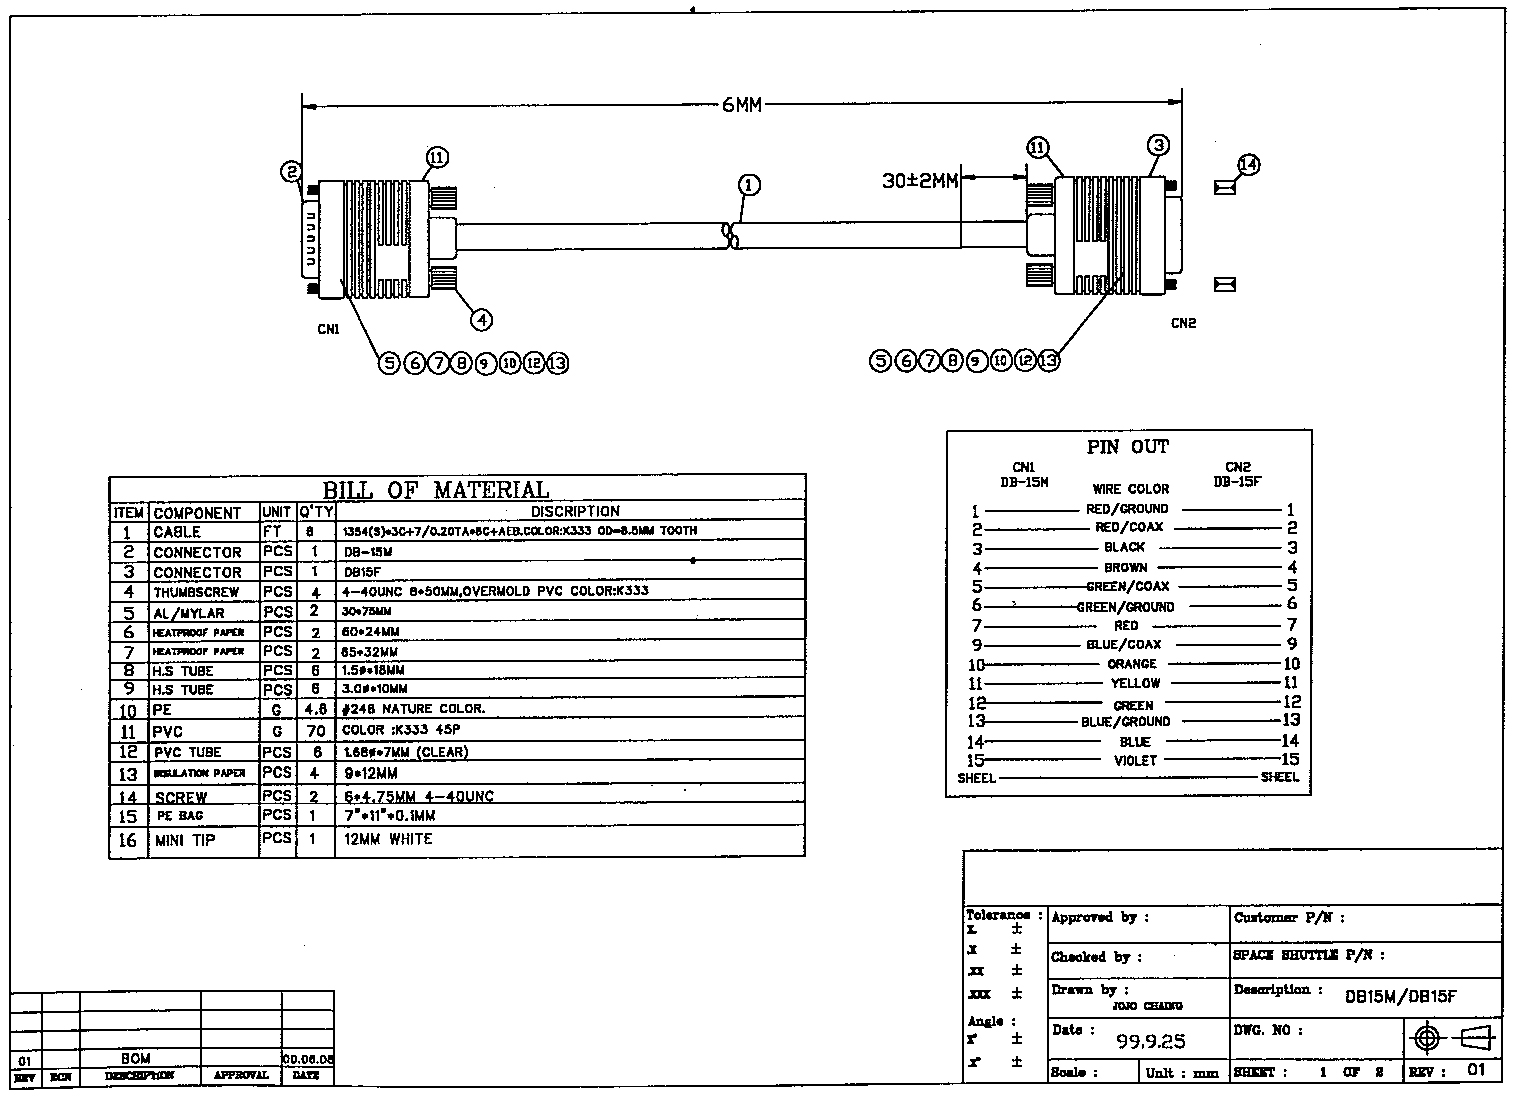 db15 to db9 wiring diagram wiring diagram all data Networking Wiring Diagram cc382 150 150ft db15 male to female straight thru multi purpose db15 female pinout db15 to db9 wiring diagram